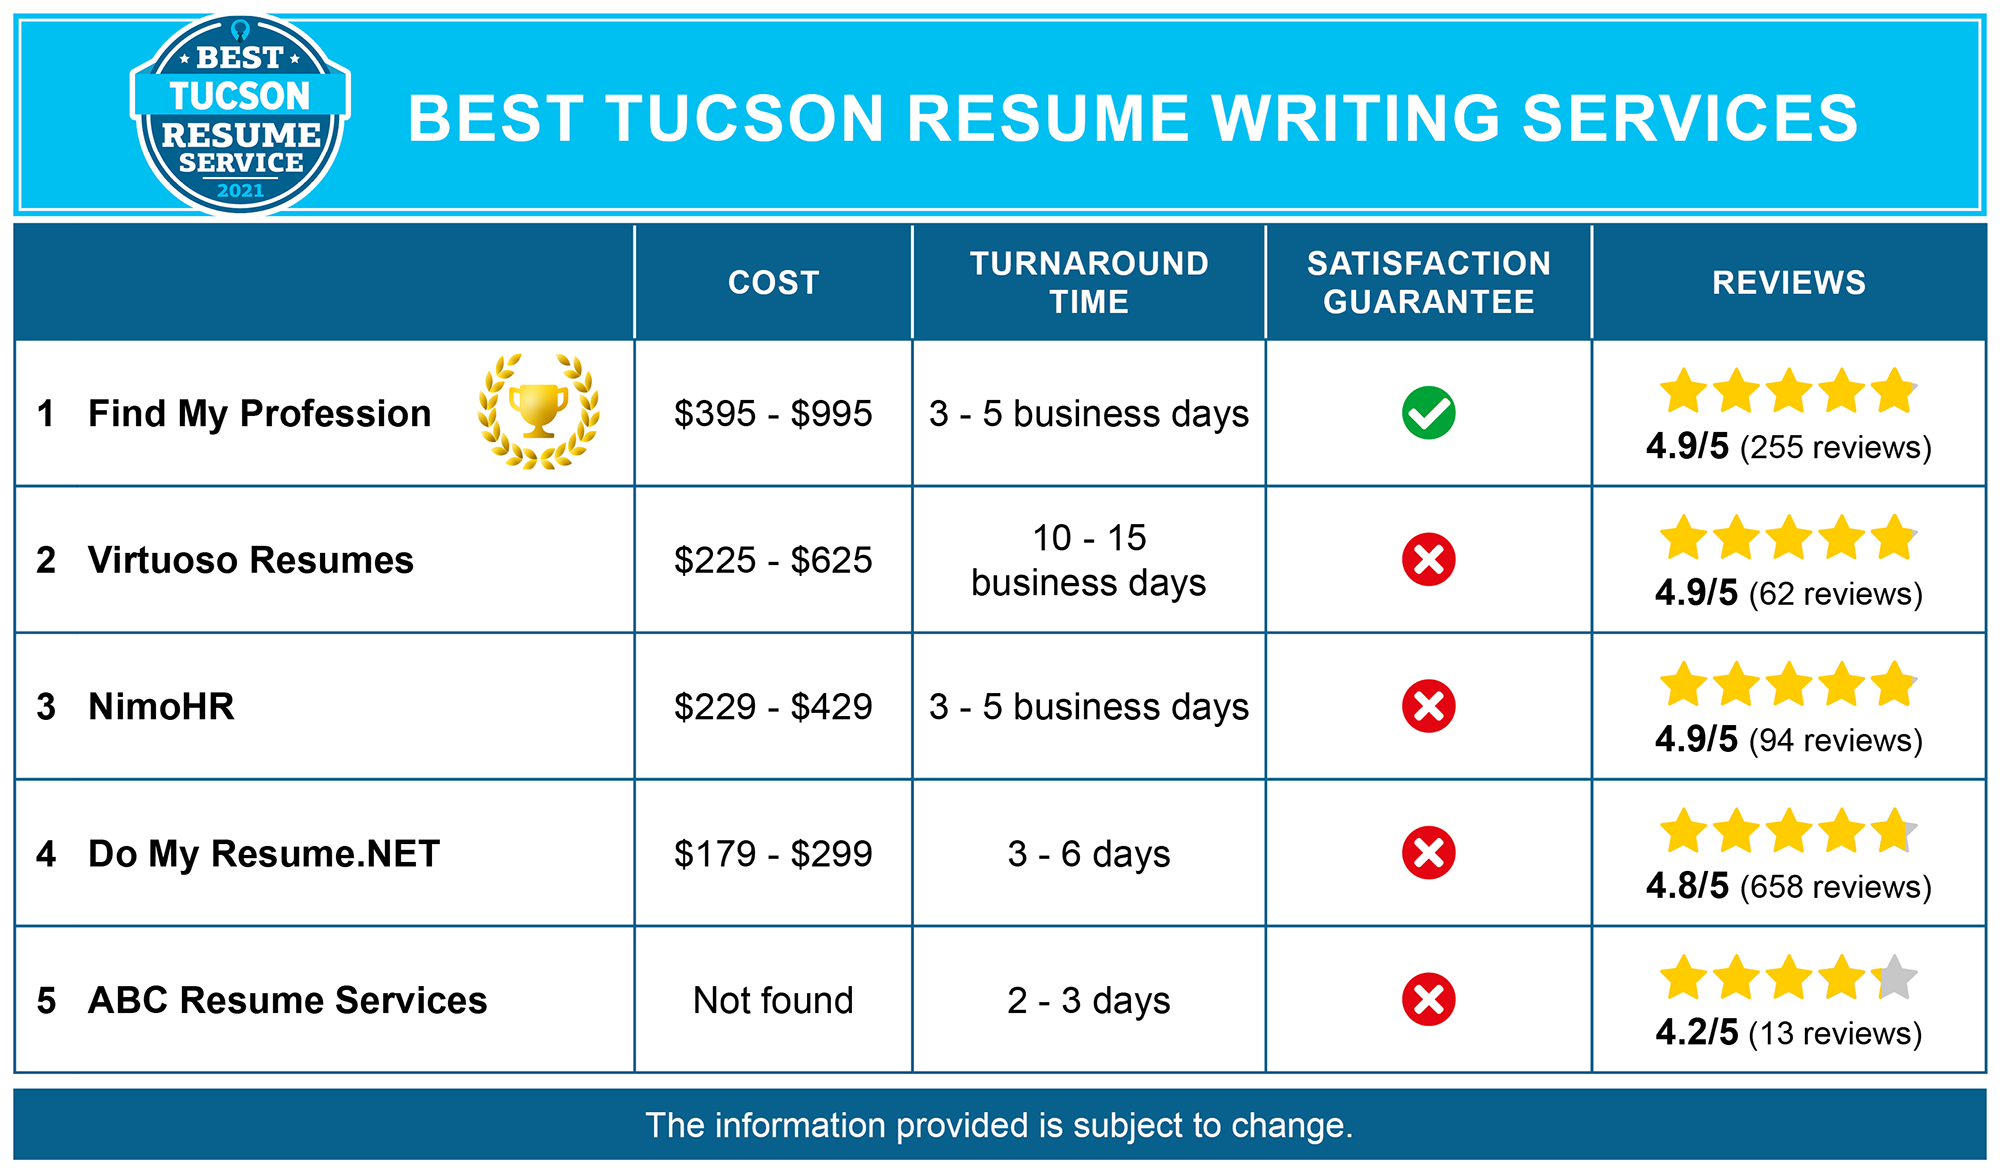 Best Tucson Resume Services